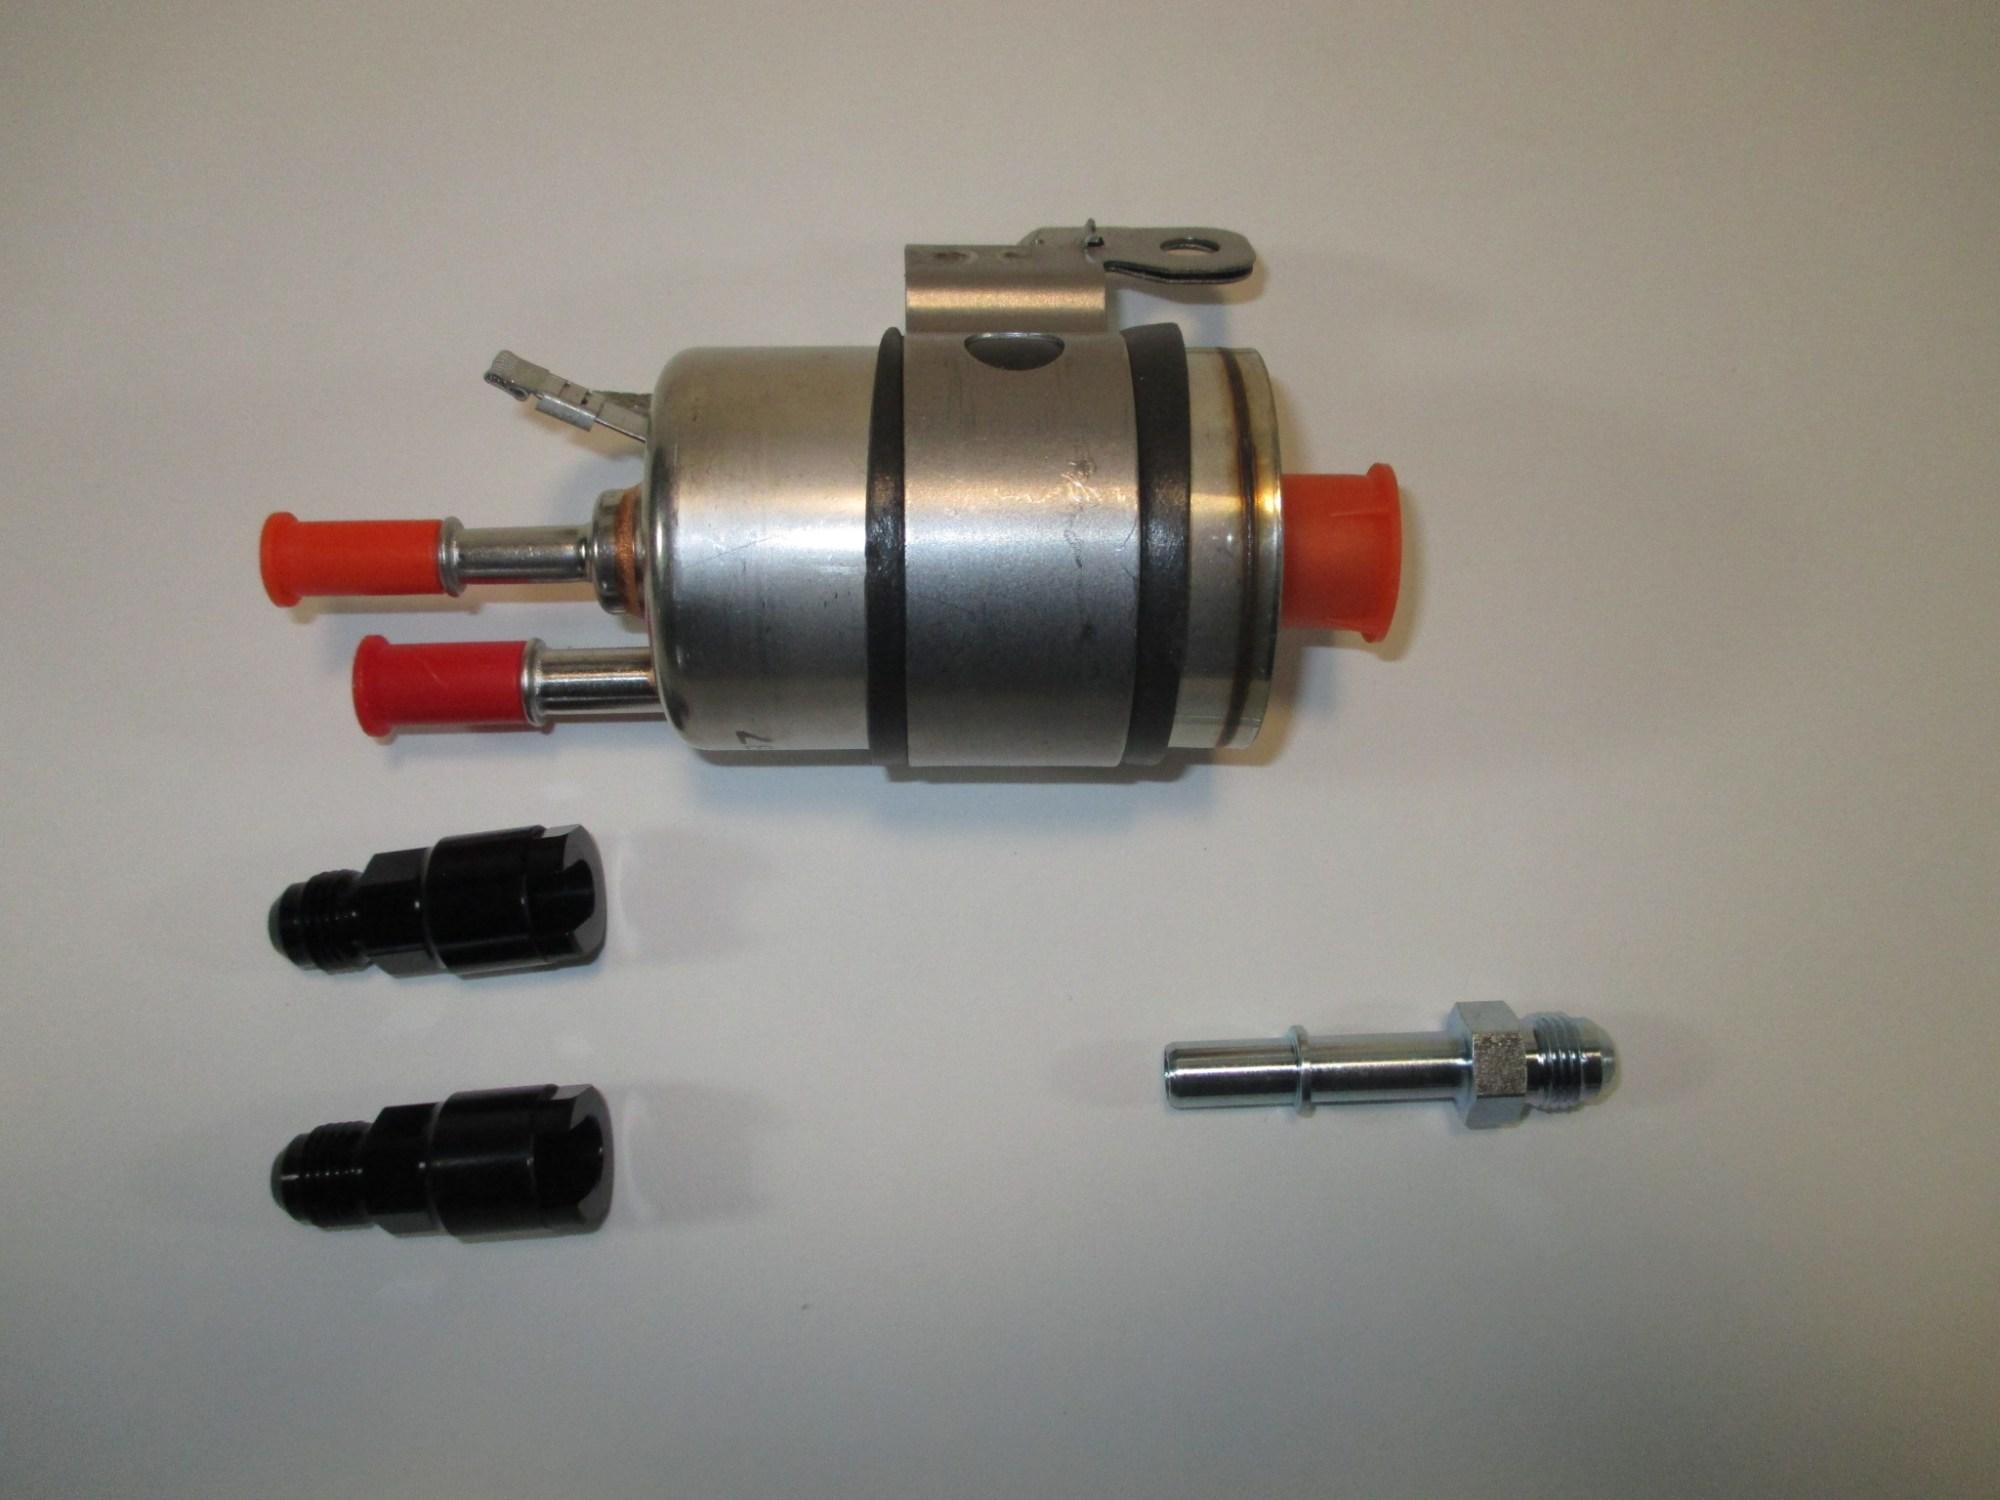 hight resolution of ls1 fuel filter regulator kit engine swap for returnless fuel railsls1 fuel filter regulator kit engine